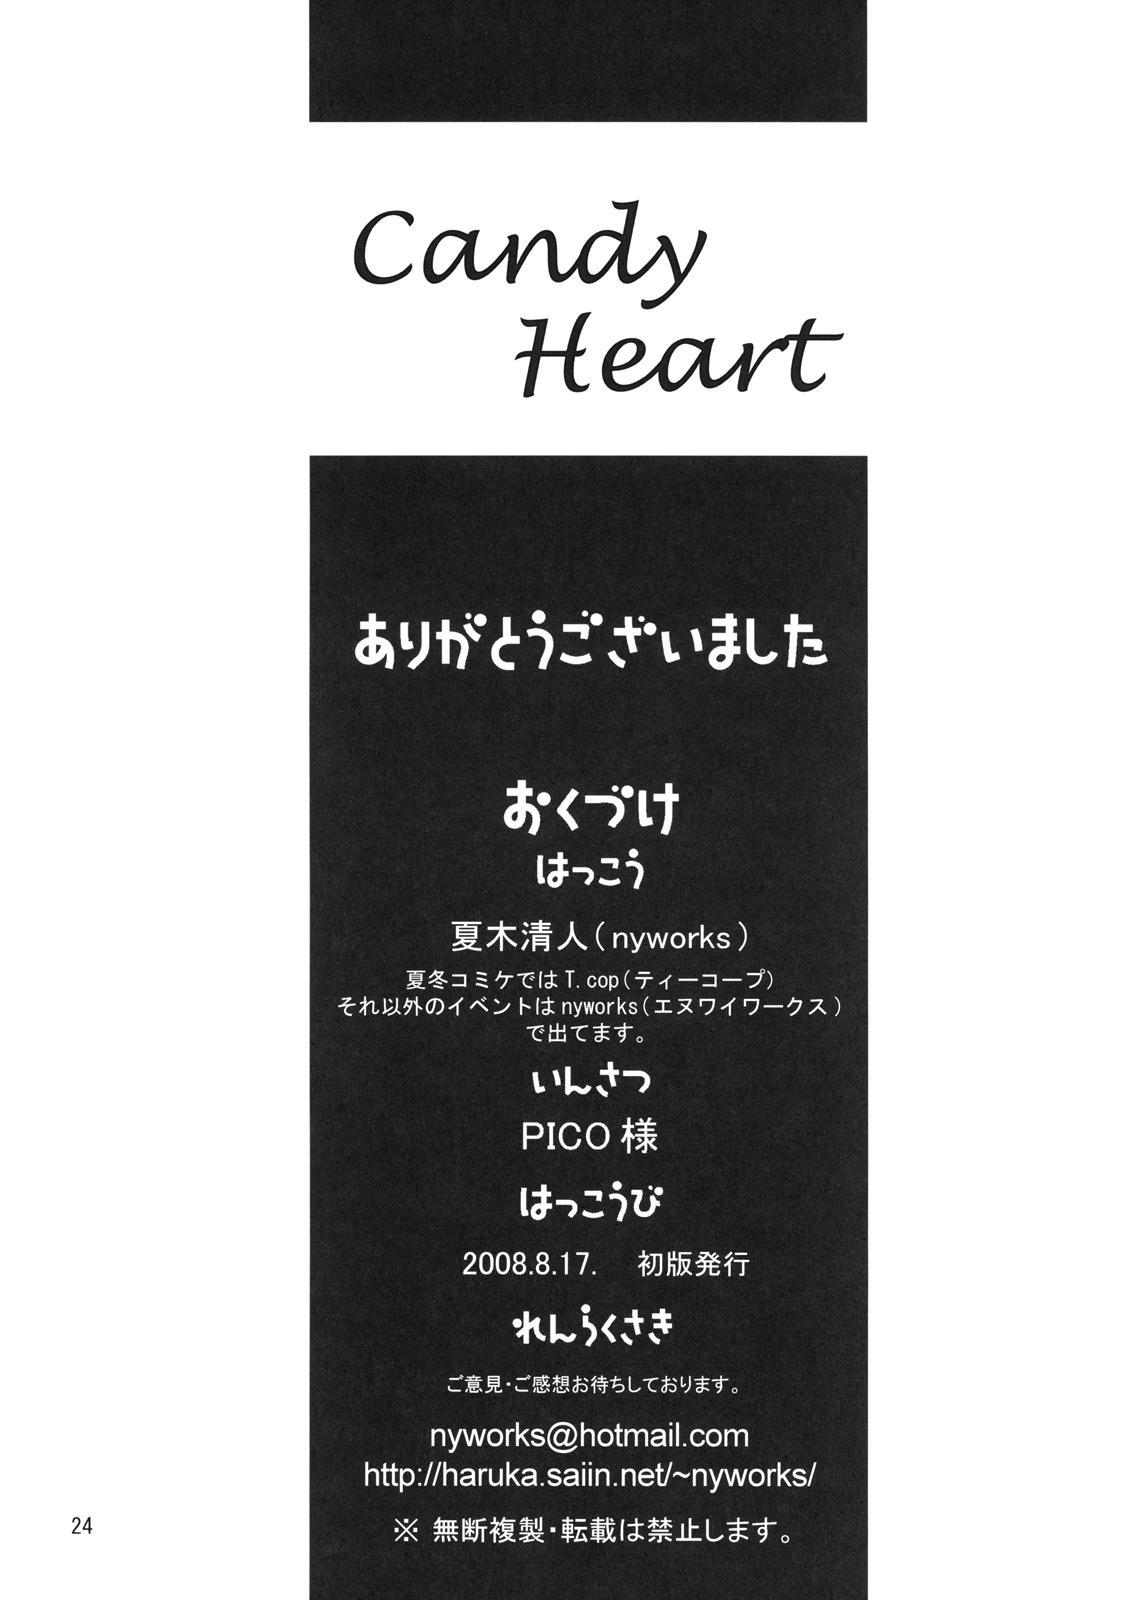 Candy Heart 25